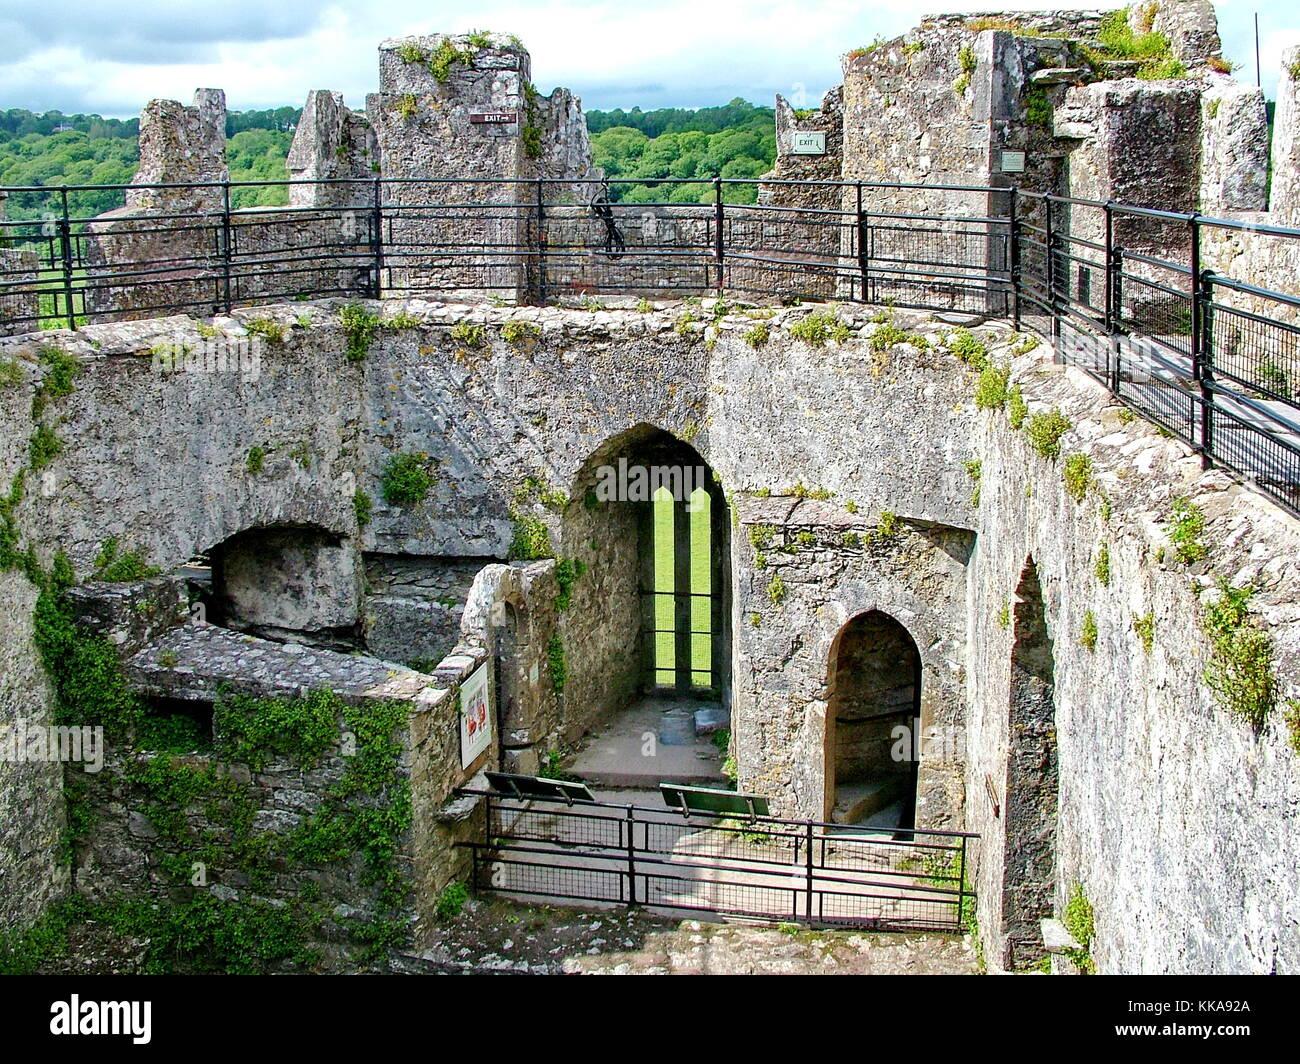 Blarney Castle, Co Cork, Ireland - Stock Image